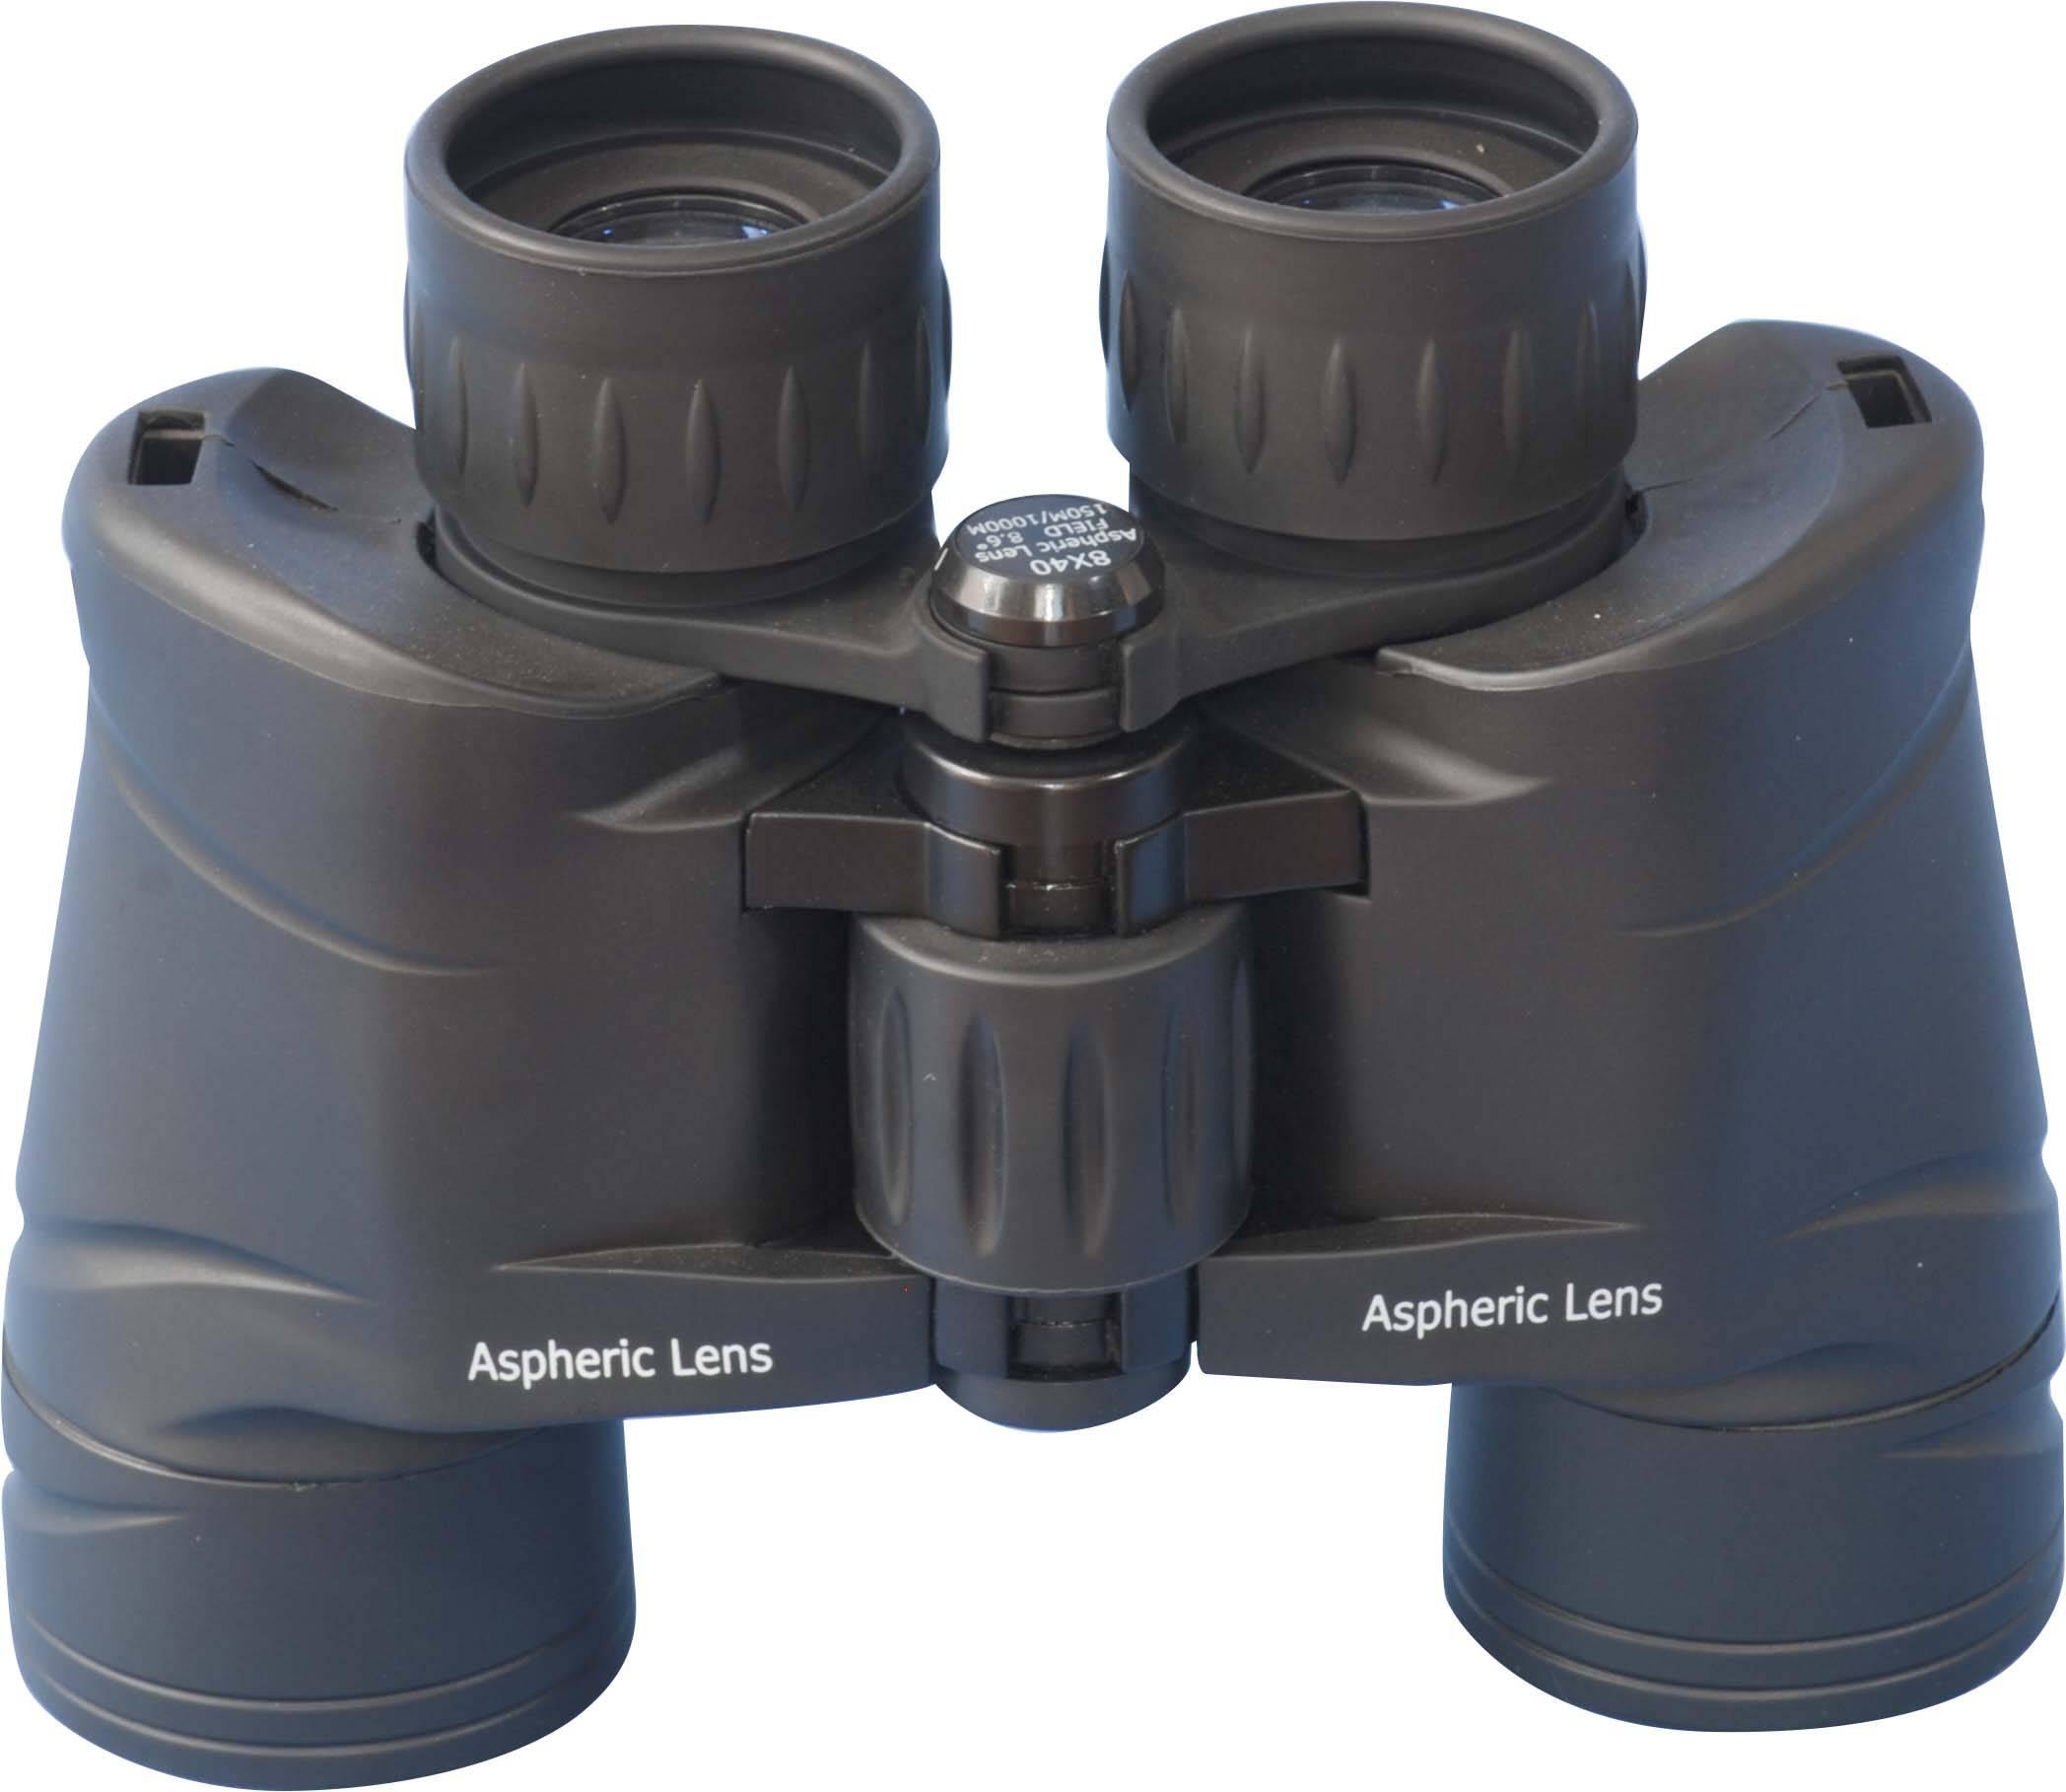 (BM-5013)8x40 porro prism waterproof long distance binoculars